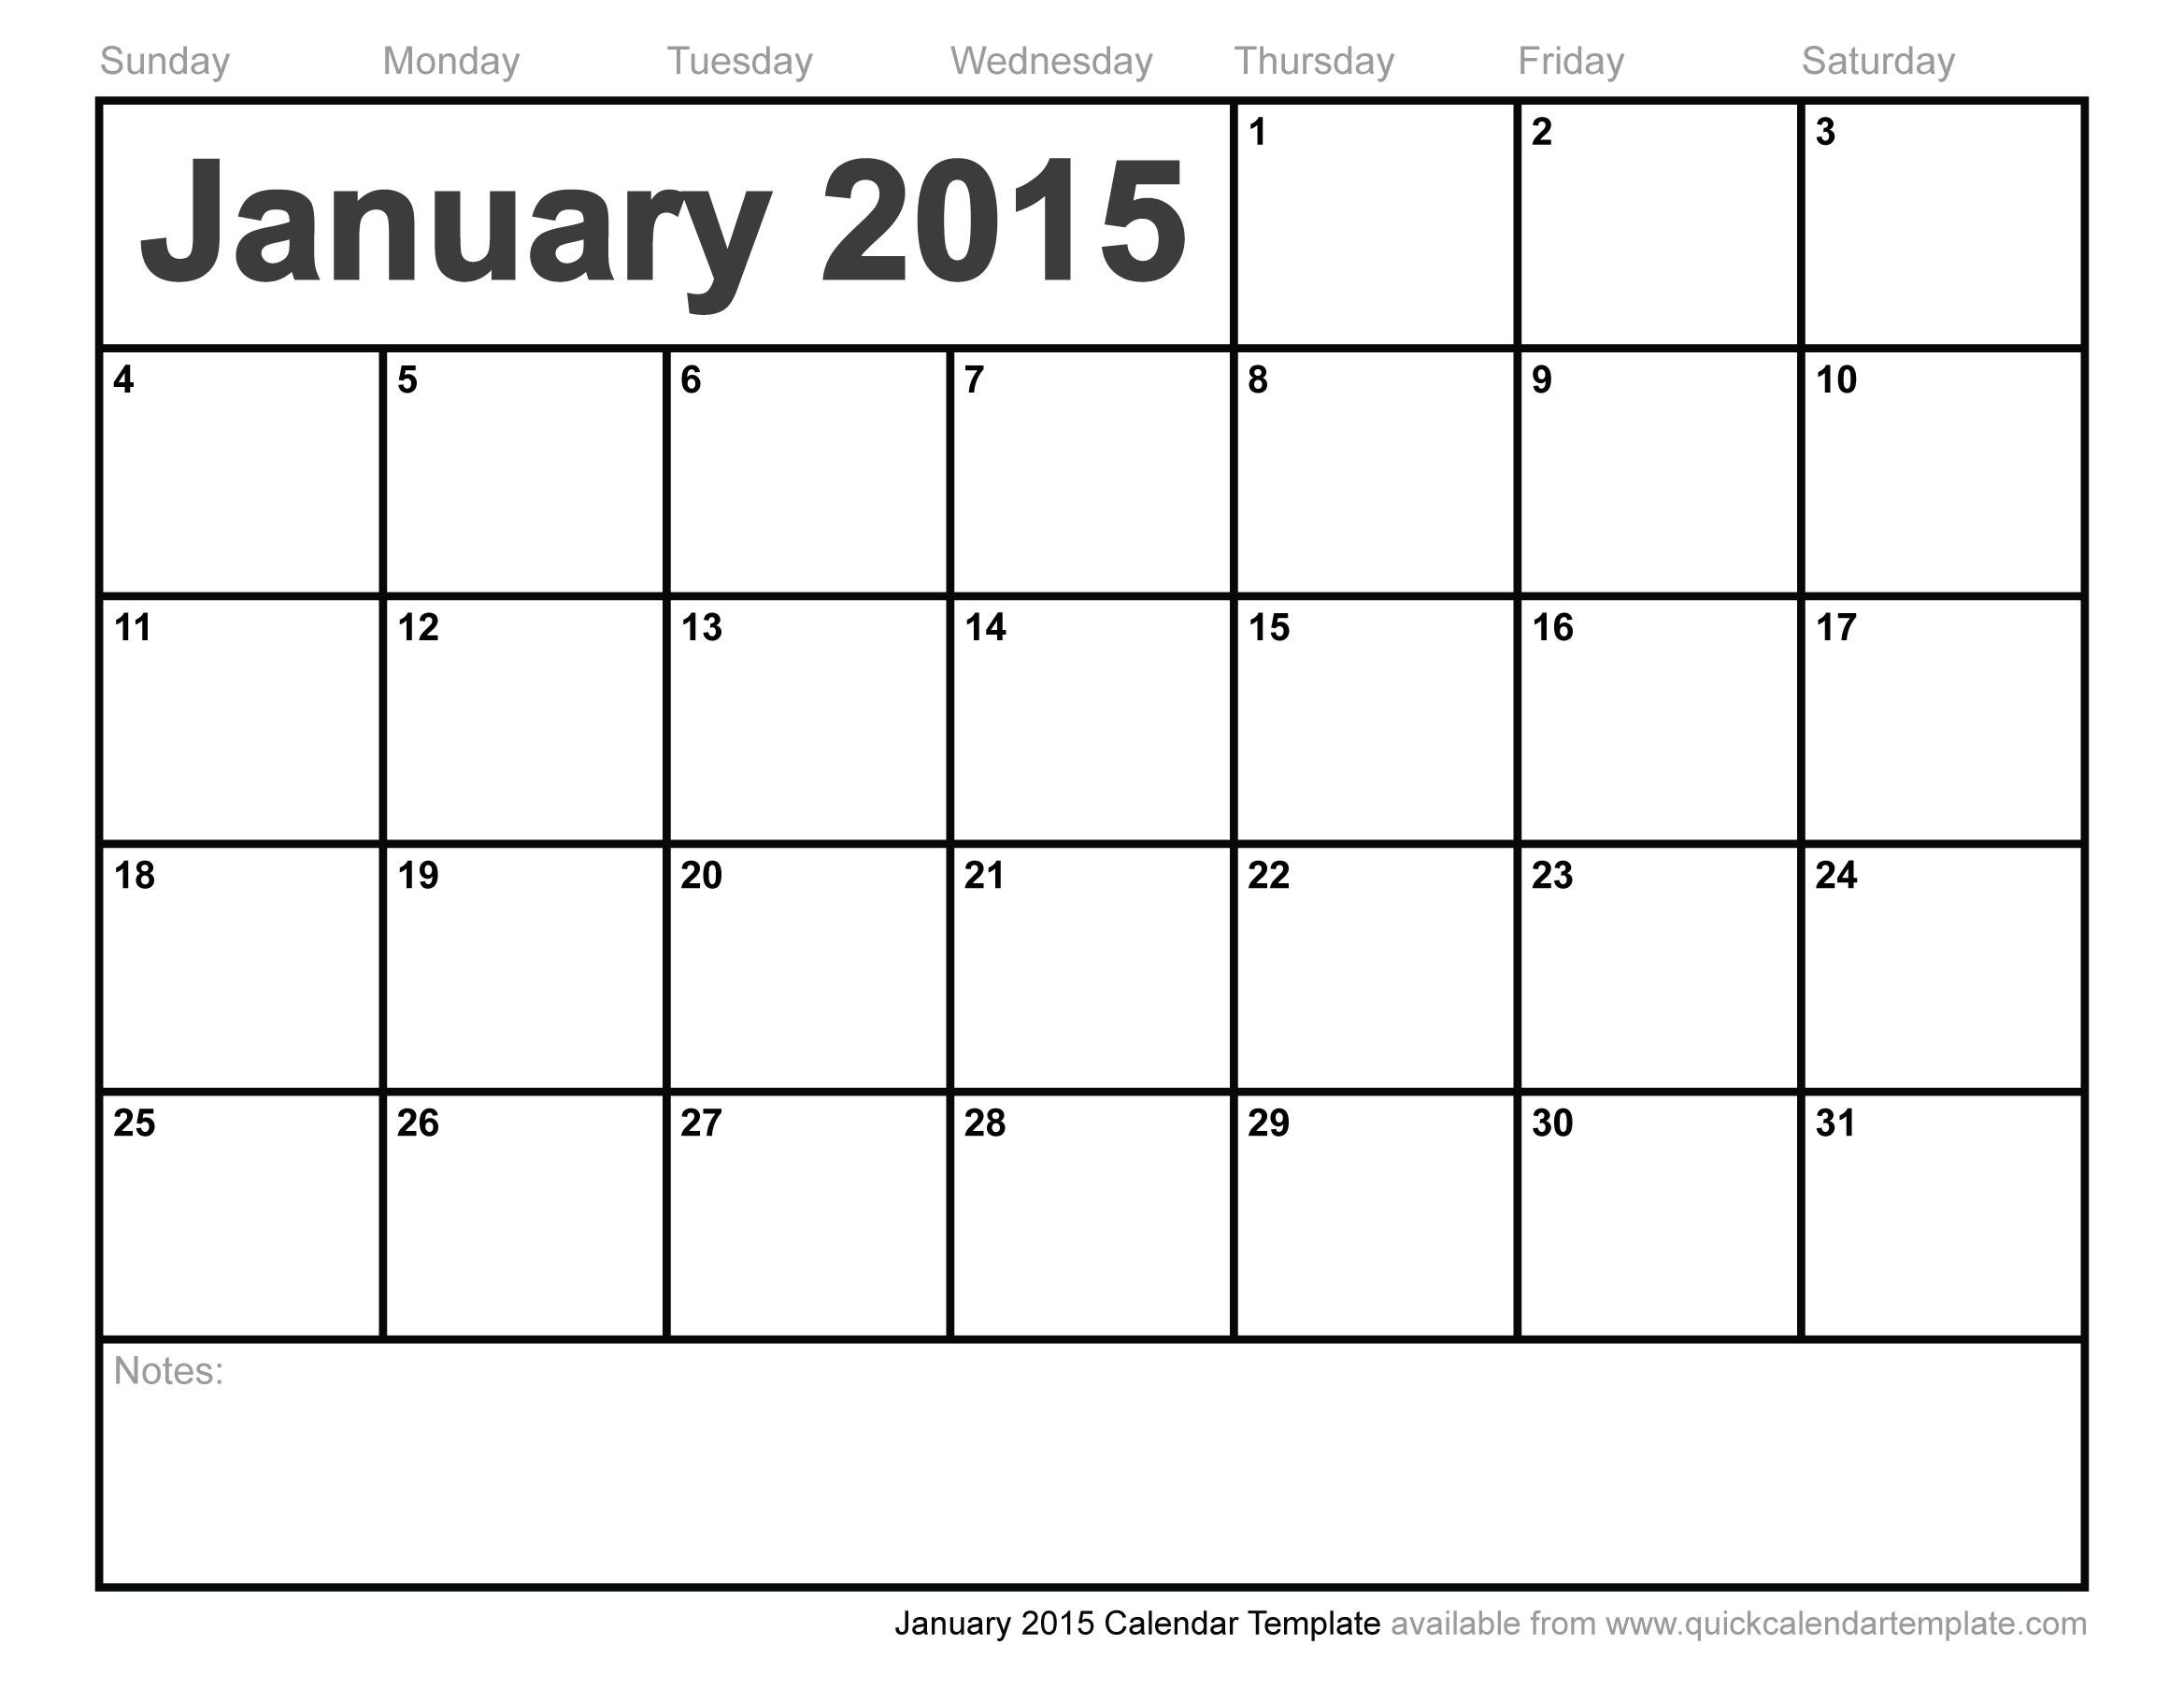 calendar template month january year 2015